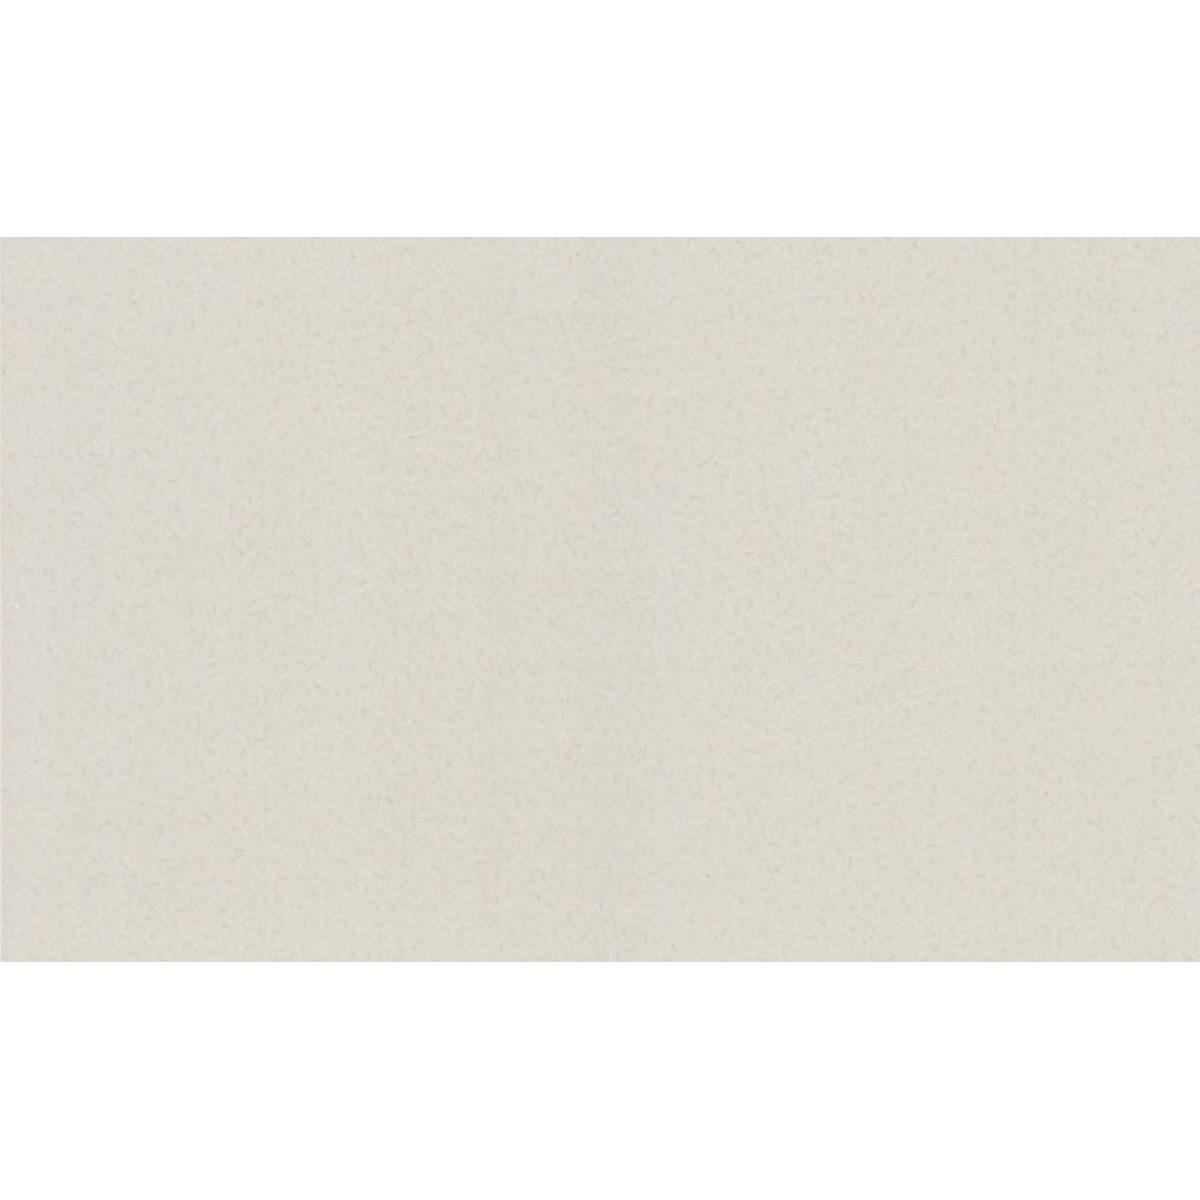 Обои флизелиновые Maxwall бежевые 1.06 м 159082-24